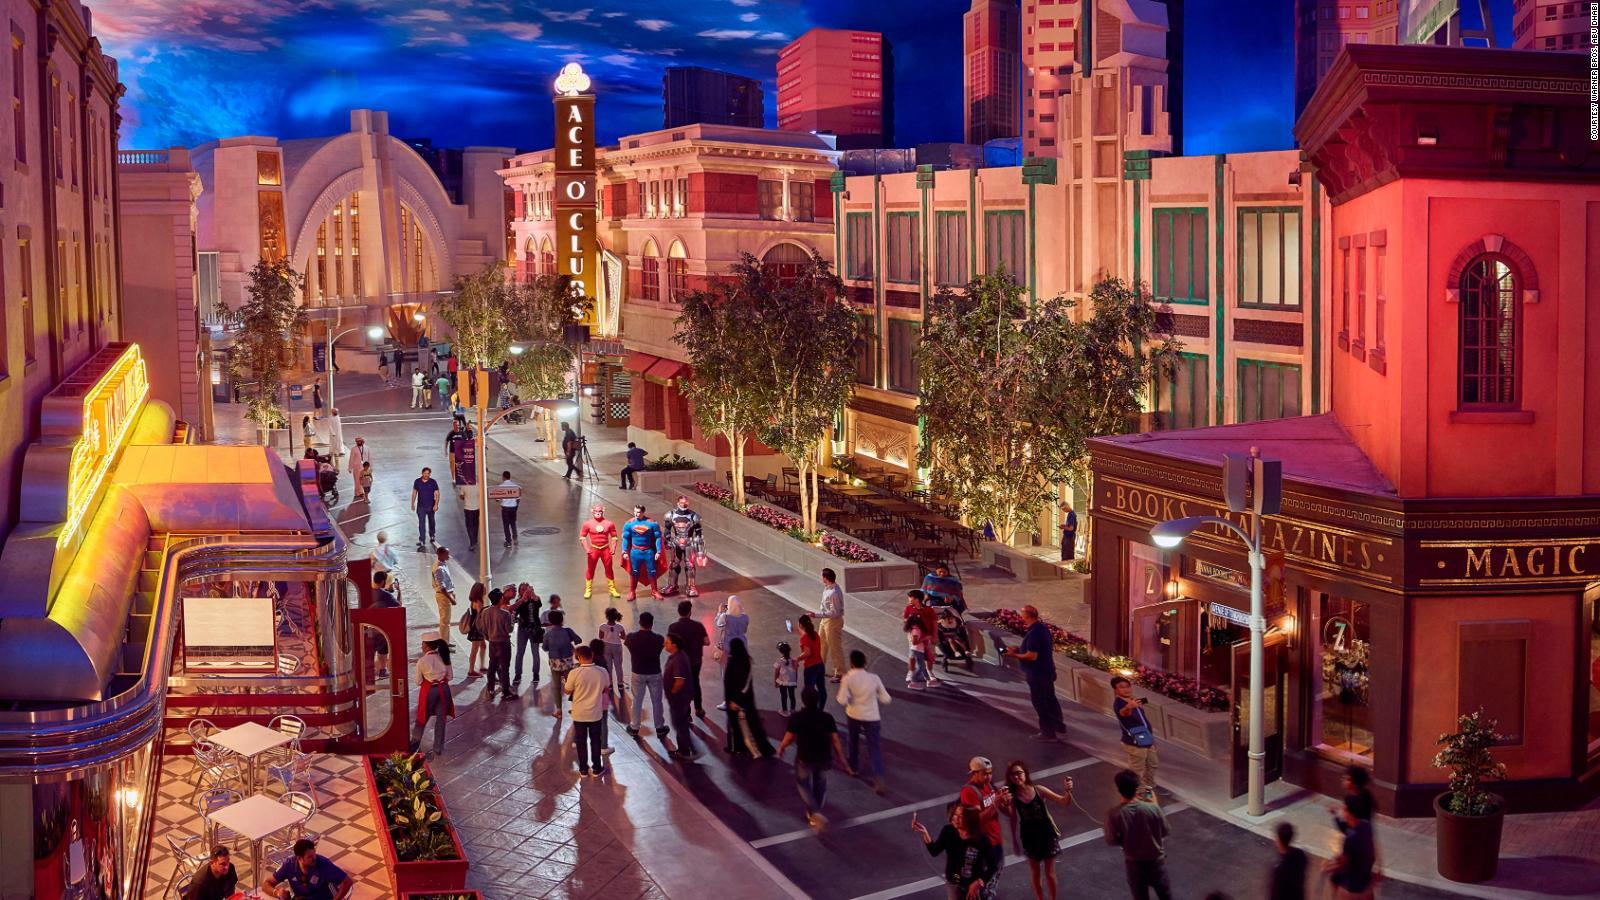 Warner Bros  World theme park opens in Abu Dhabi | CNN Travel